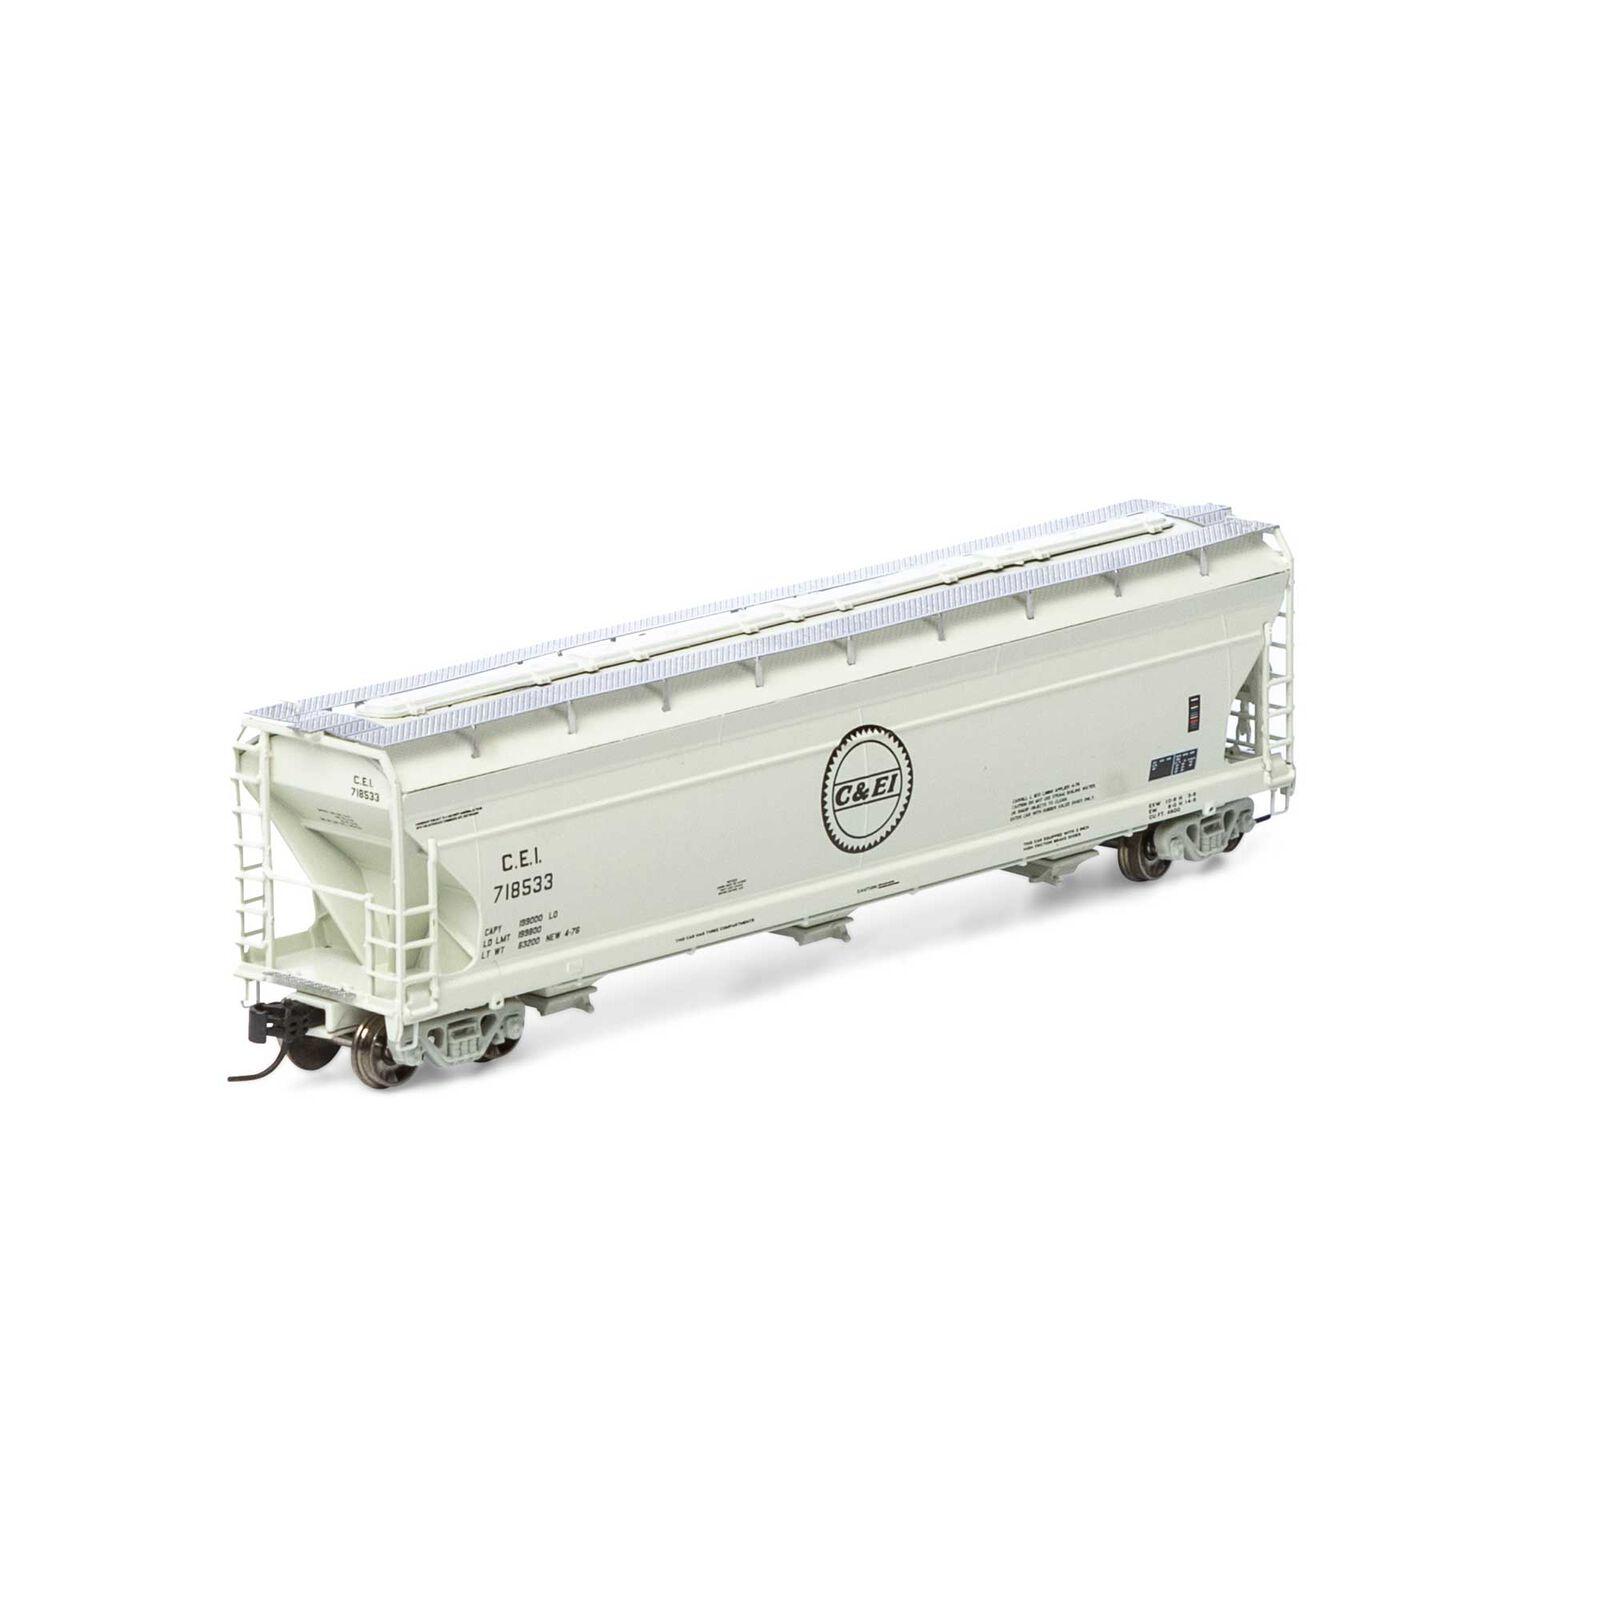 N ACF 4600 3-Bay Centerflow Hopper, C&EI #718533